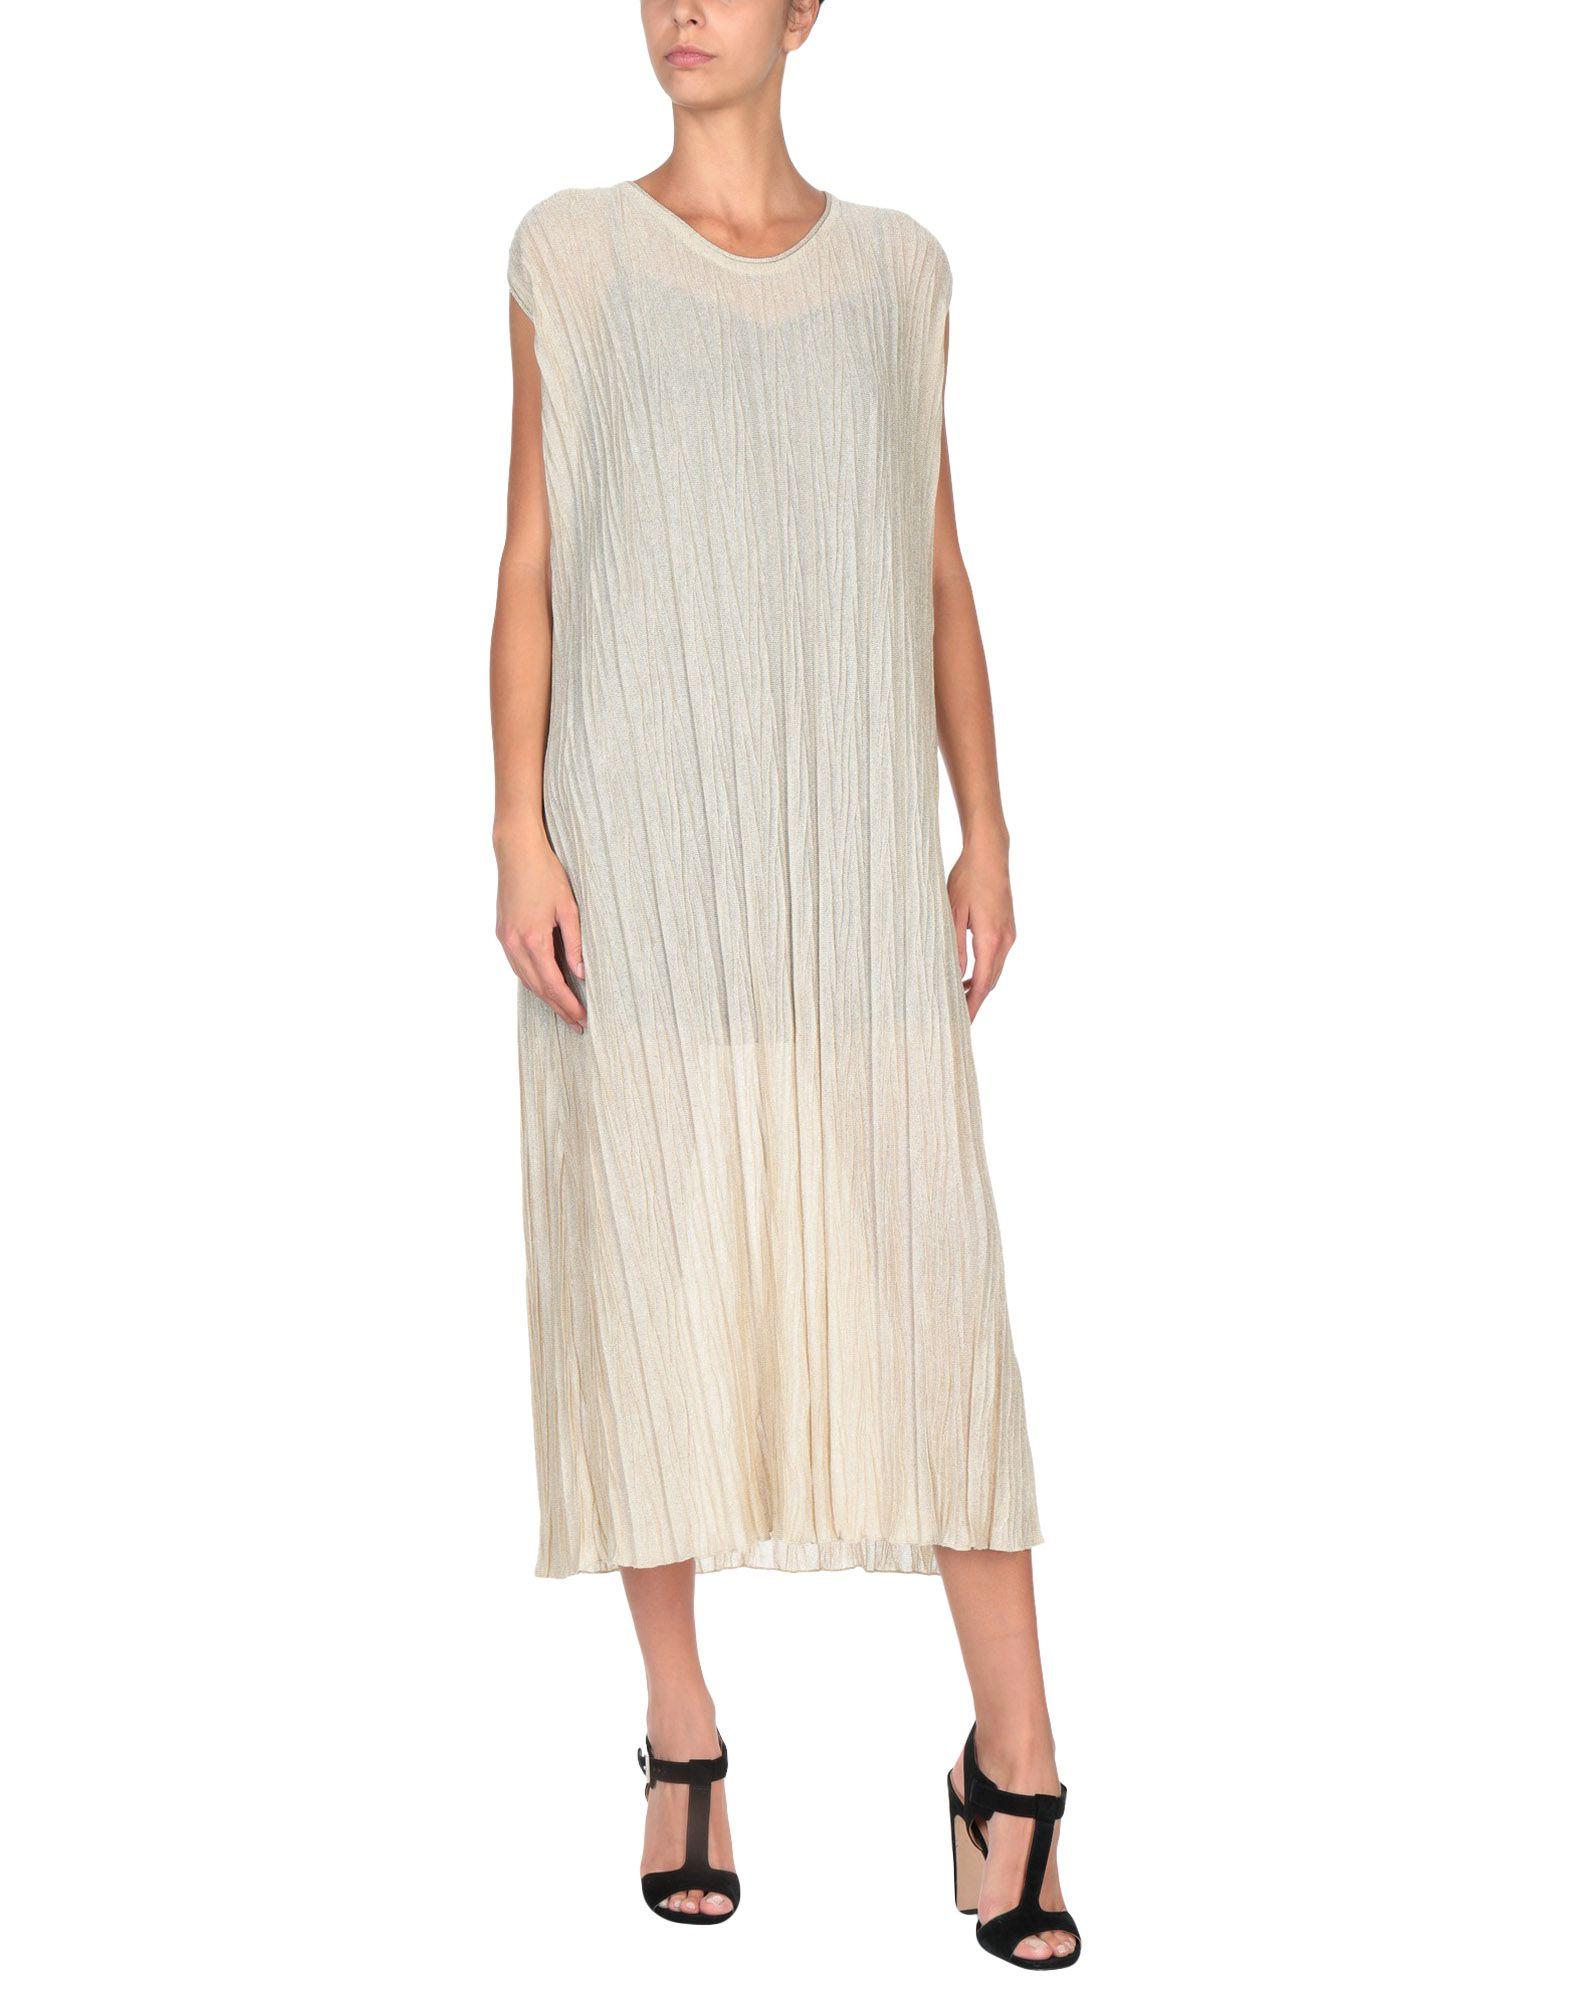 TABARONI CASHMERE Платье длиной 3/4 tabaroni cashmere свитер